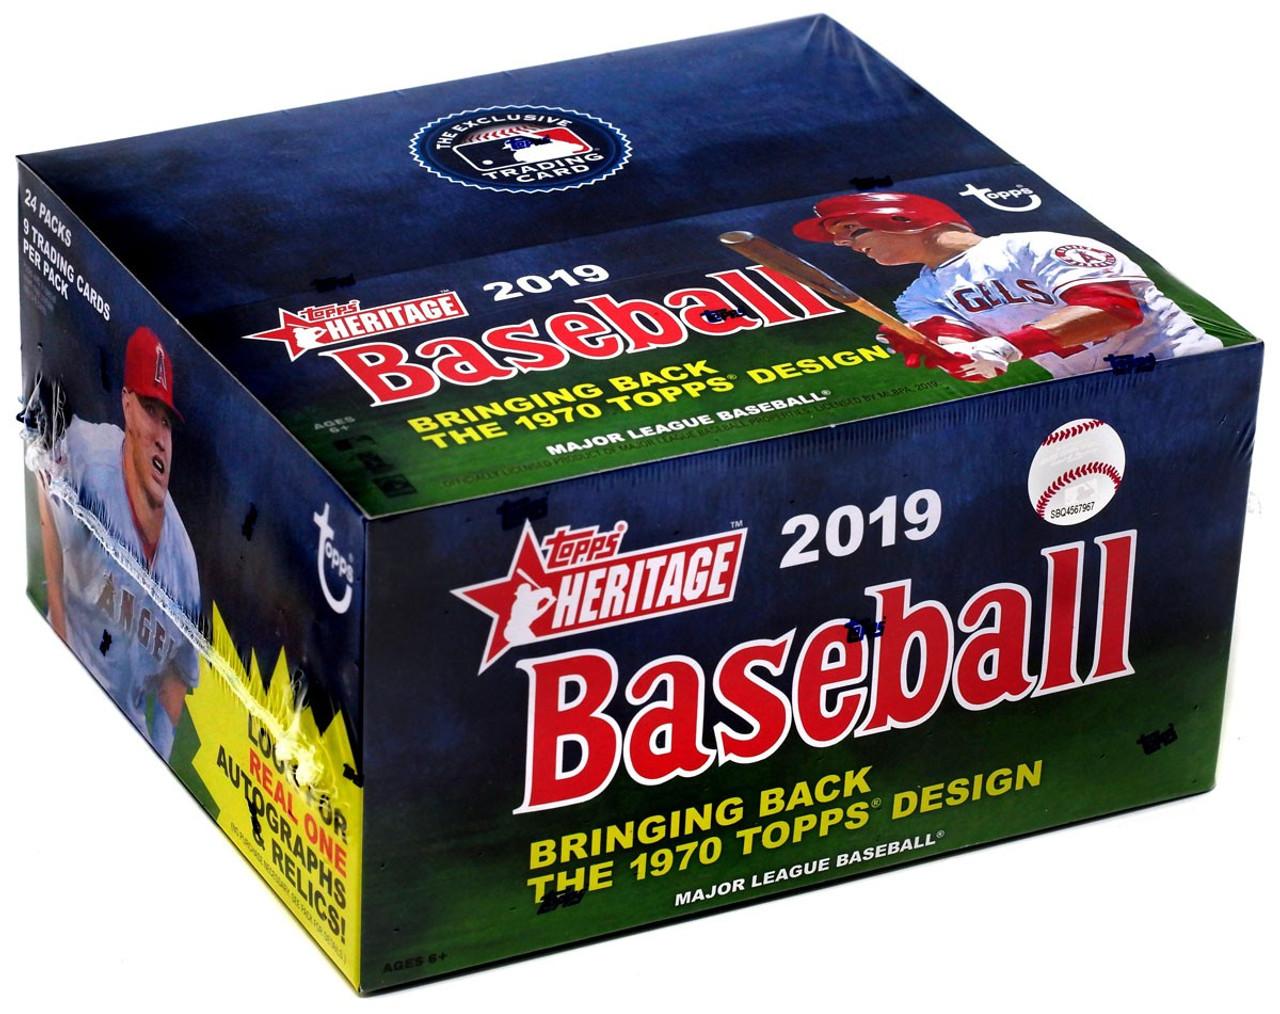 Mlb 2019 Topps Heritage Baseball Trading Card Retail Box 24 Packs